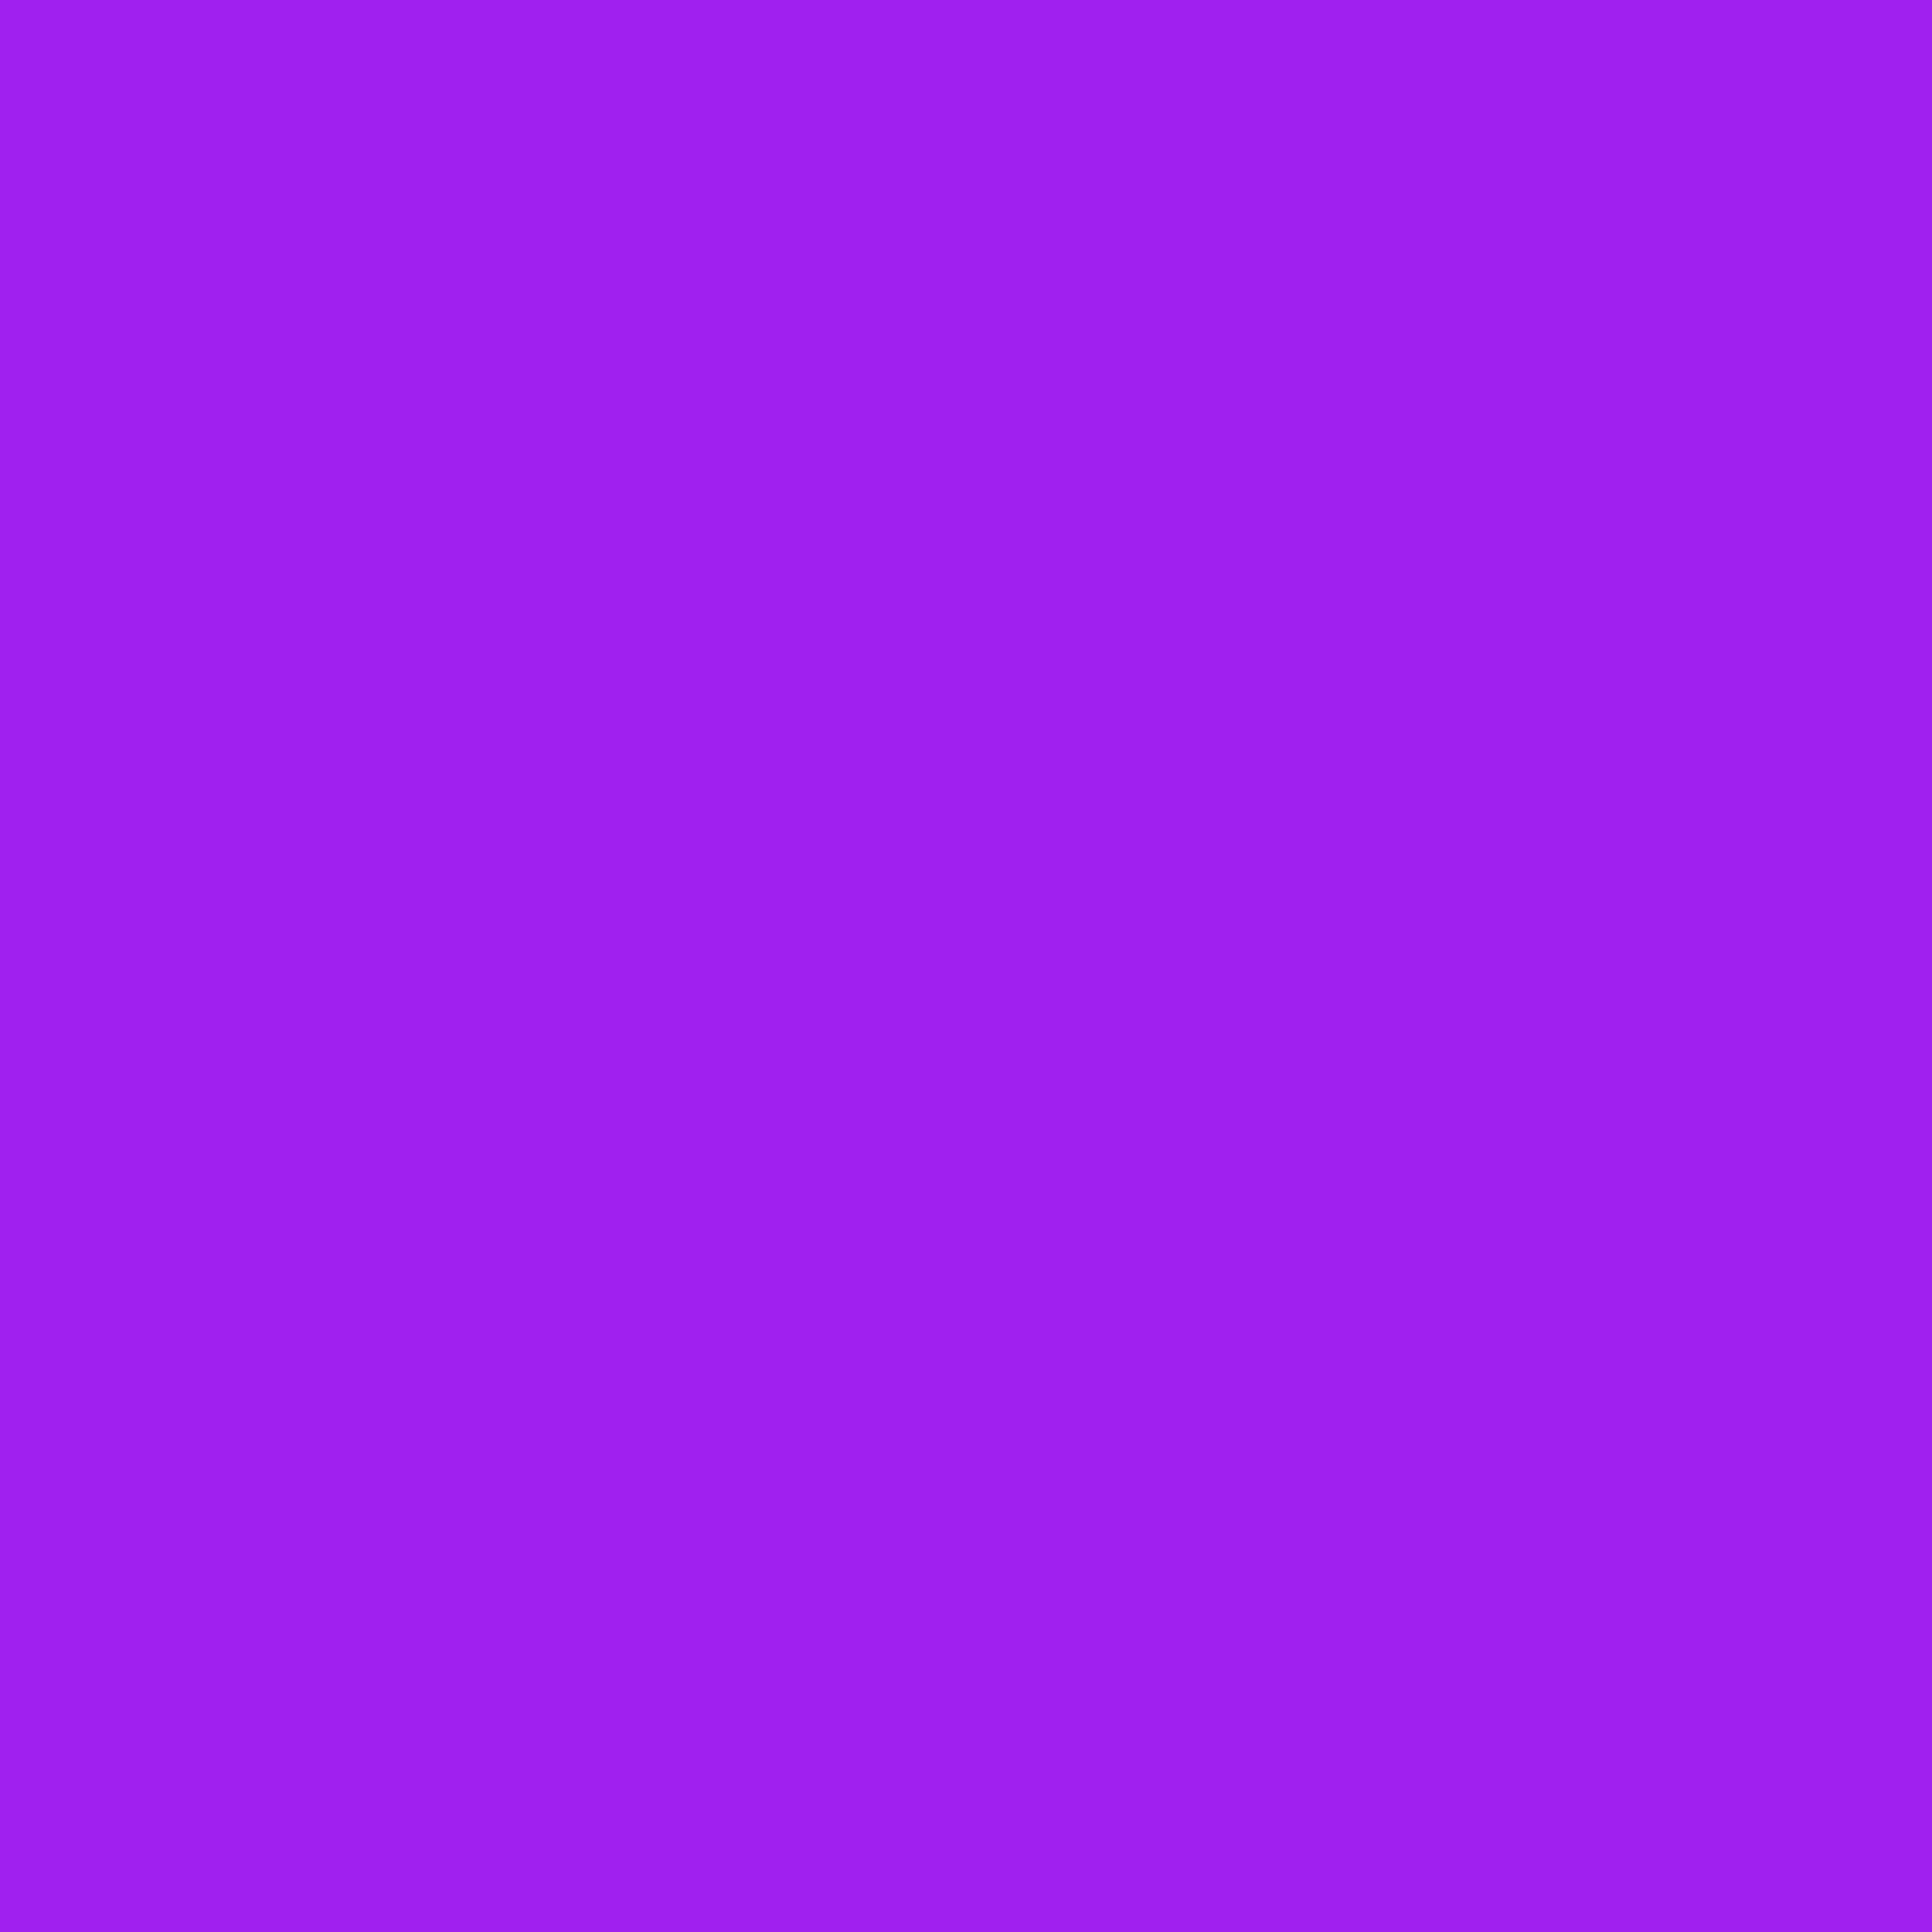 2732x2732 Purple X11 Gui Solid Color Background